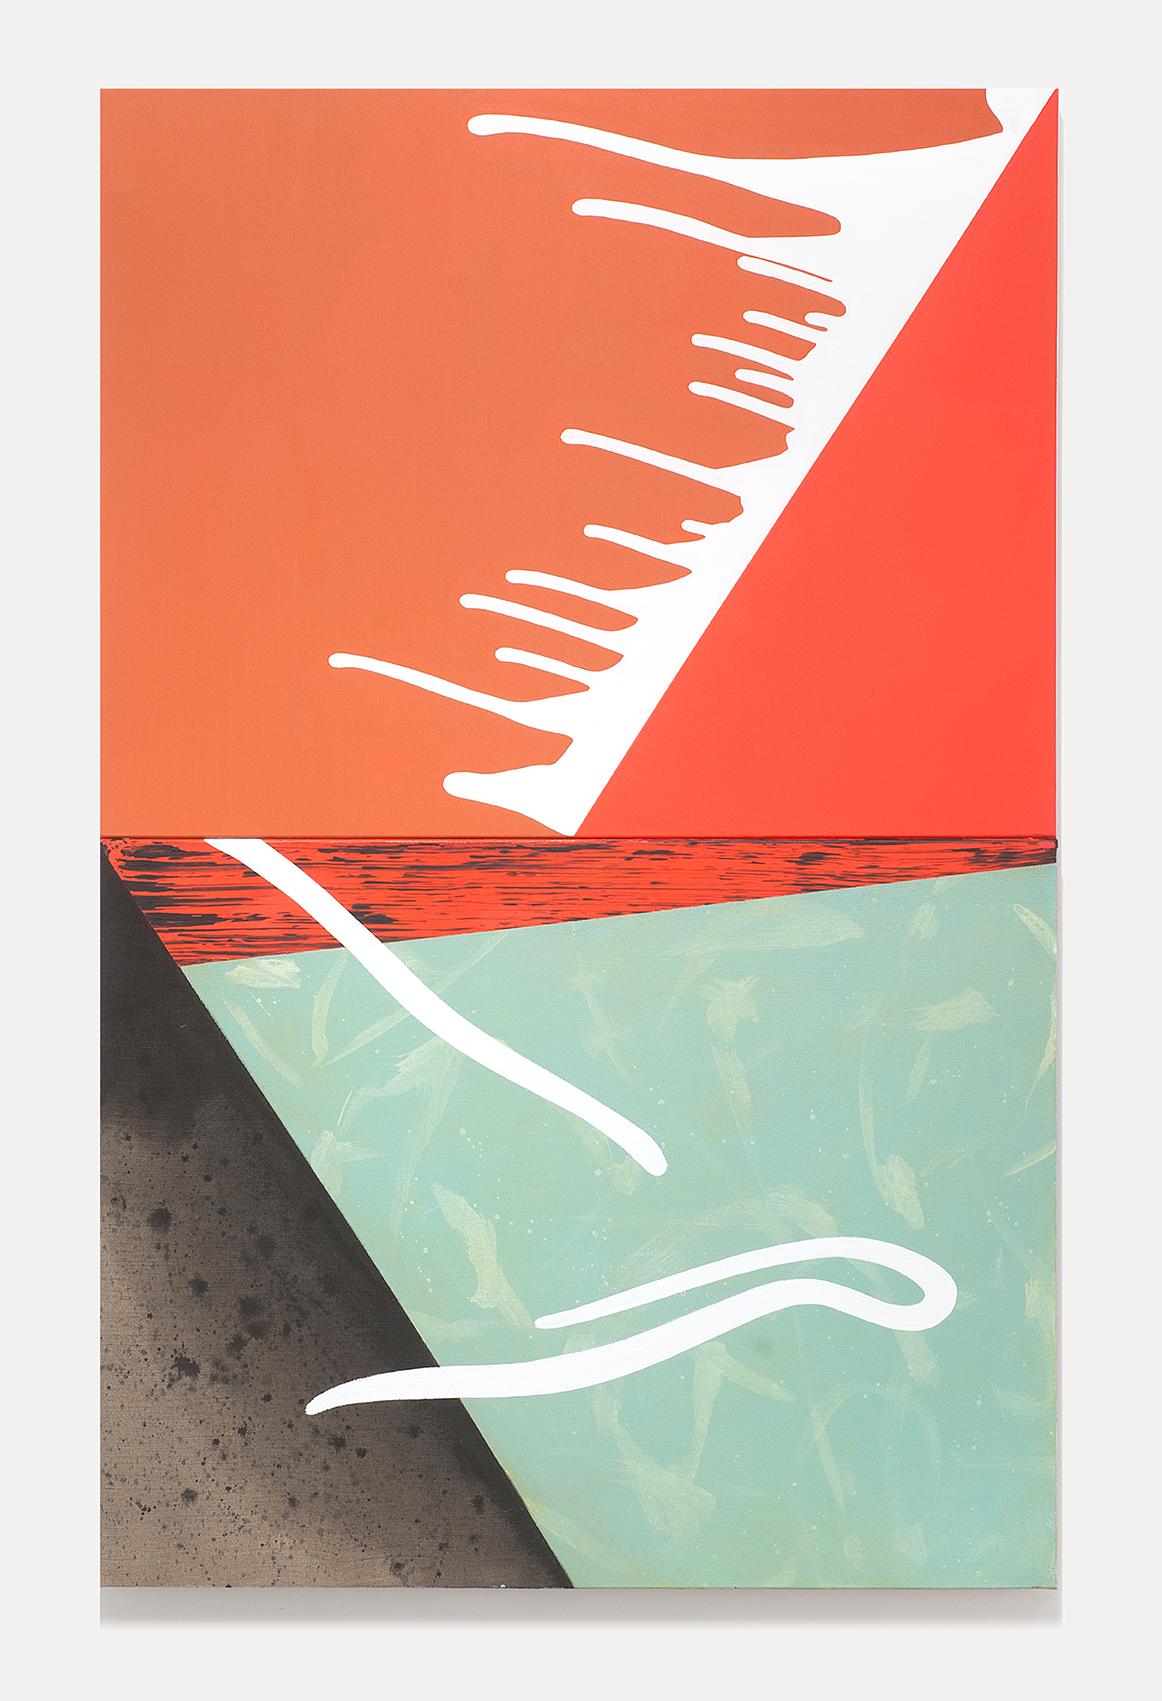 Jean-Marc Thommen, courtesy galerie Jean Fourner